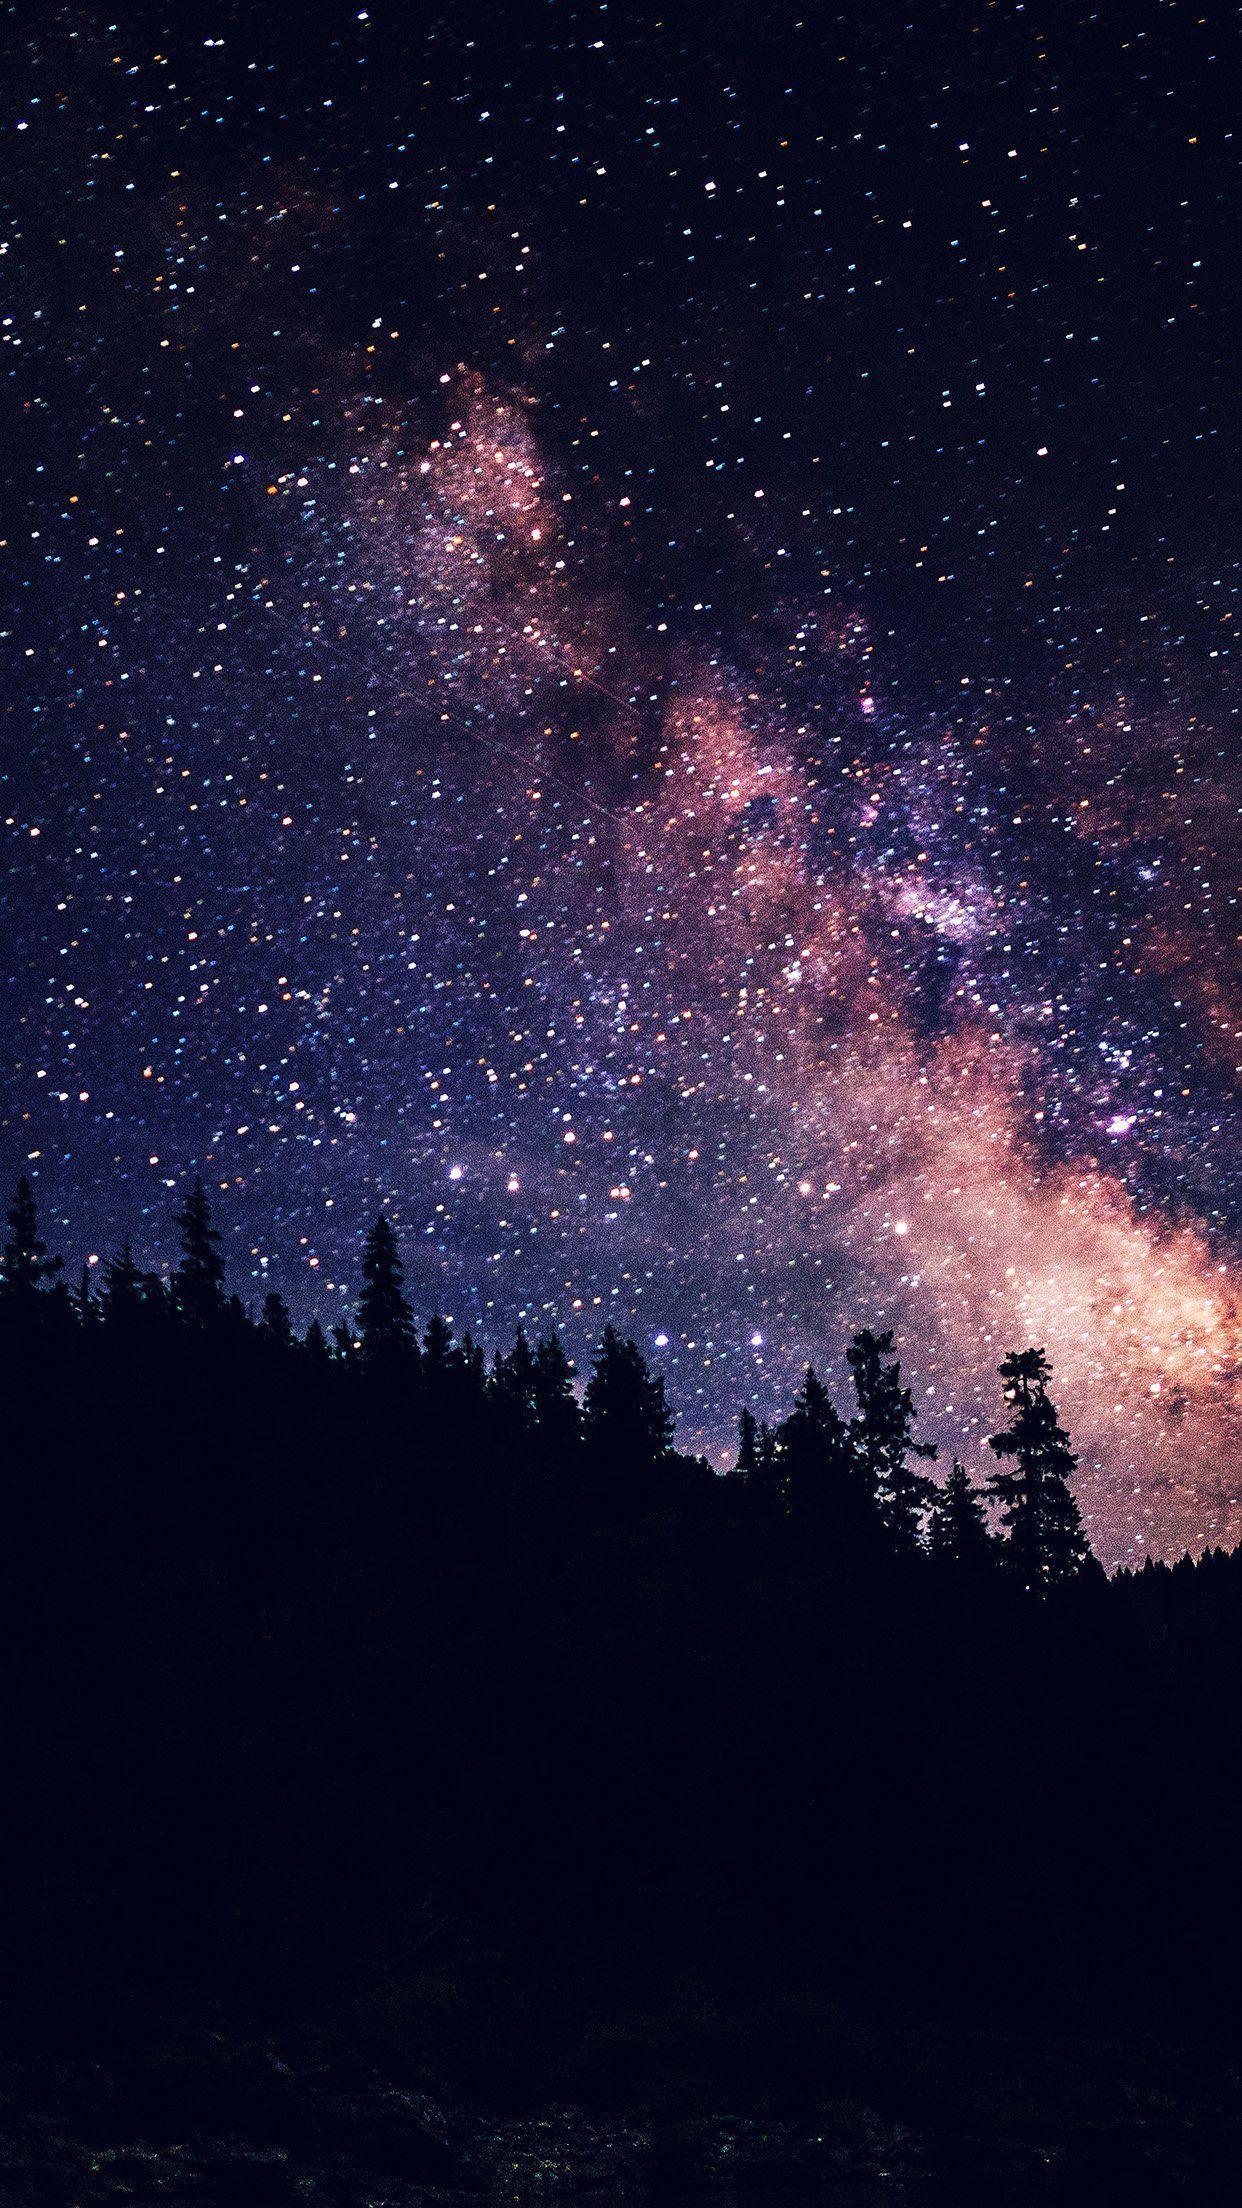 Night Sky Dark Space Milkyway Star Nature Android Wallpaper Night Sky Wallpaper Night Sky Photography Scenery Wallpaper